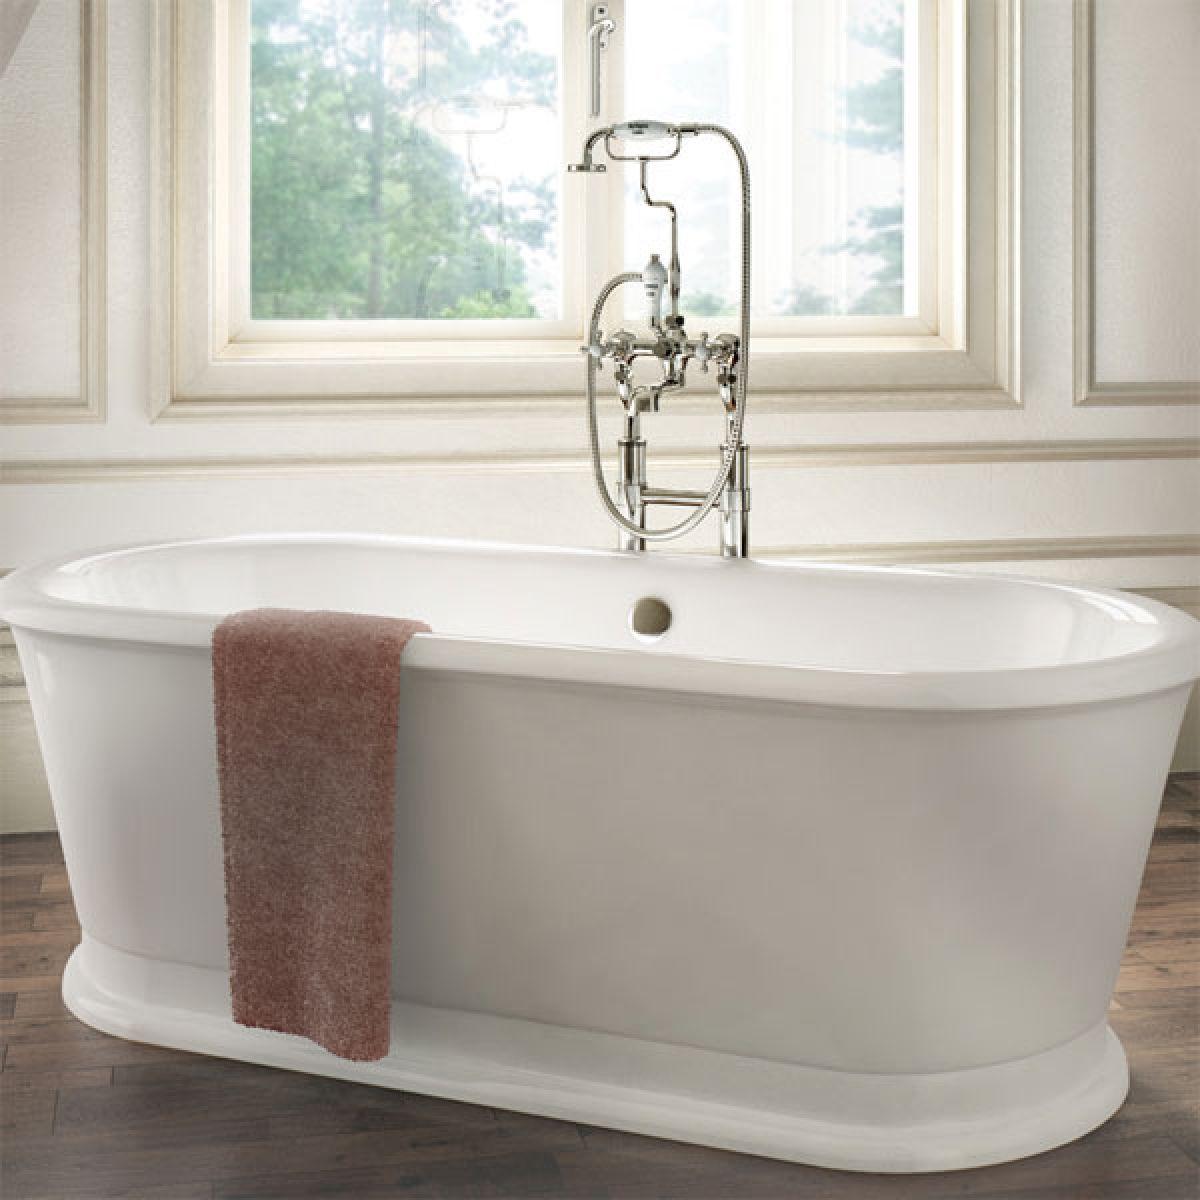 Burlington London Round Soaking Tub 1800mm Lifestyle